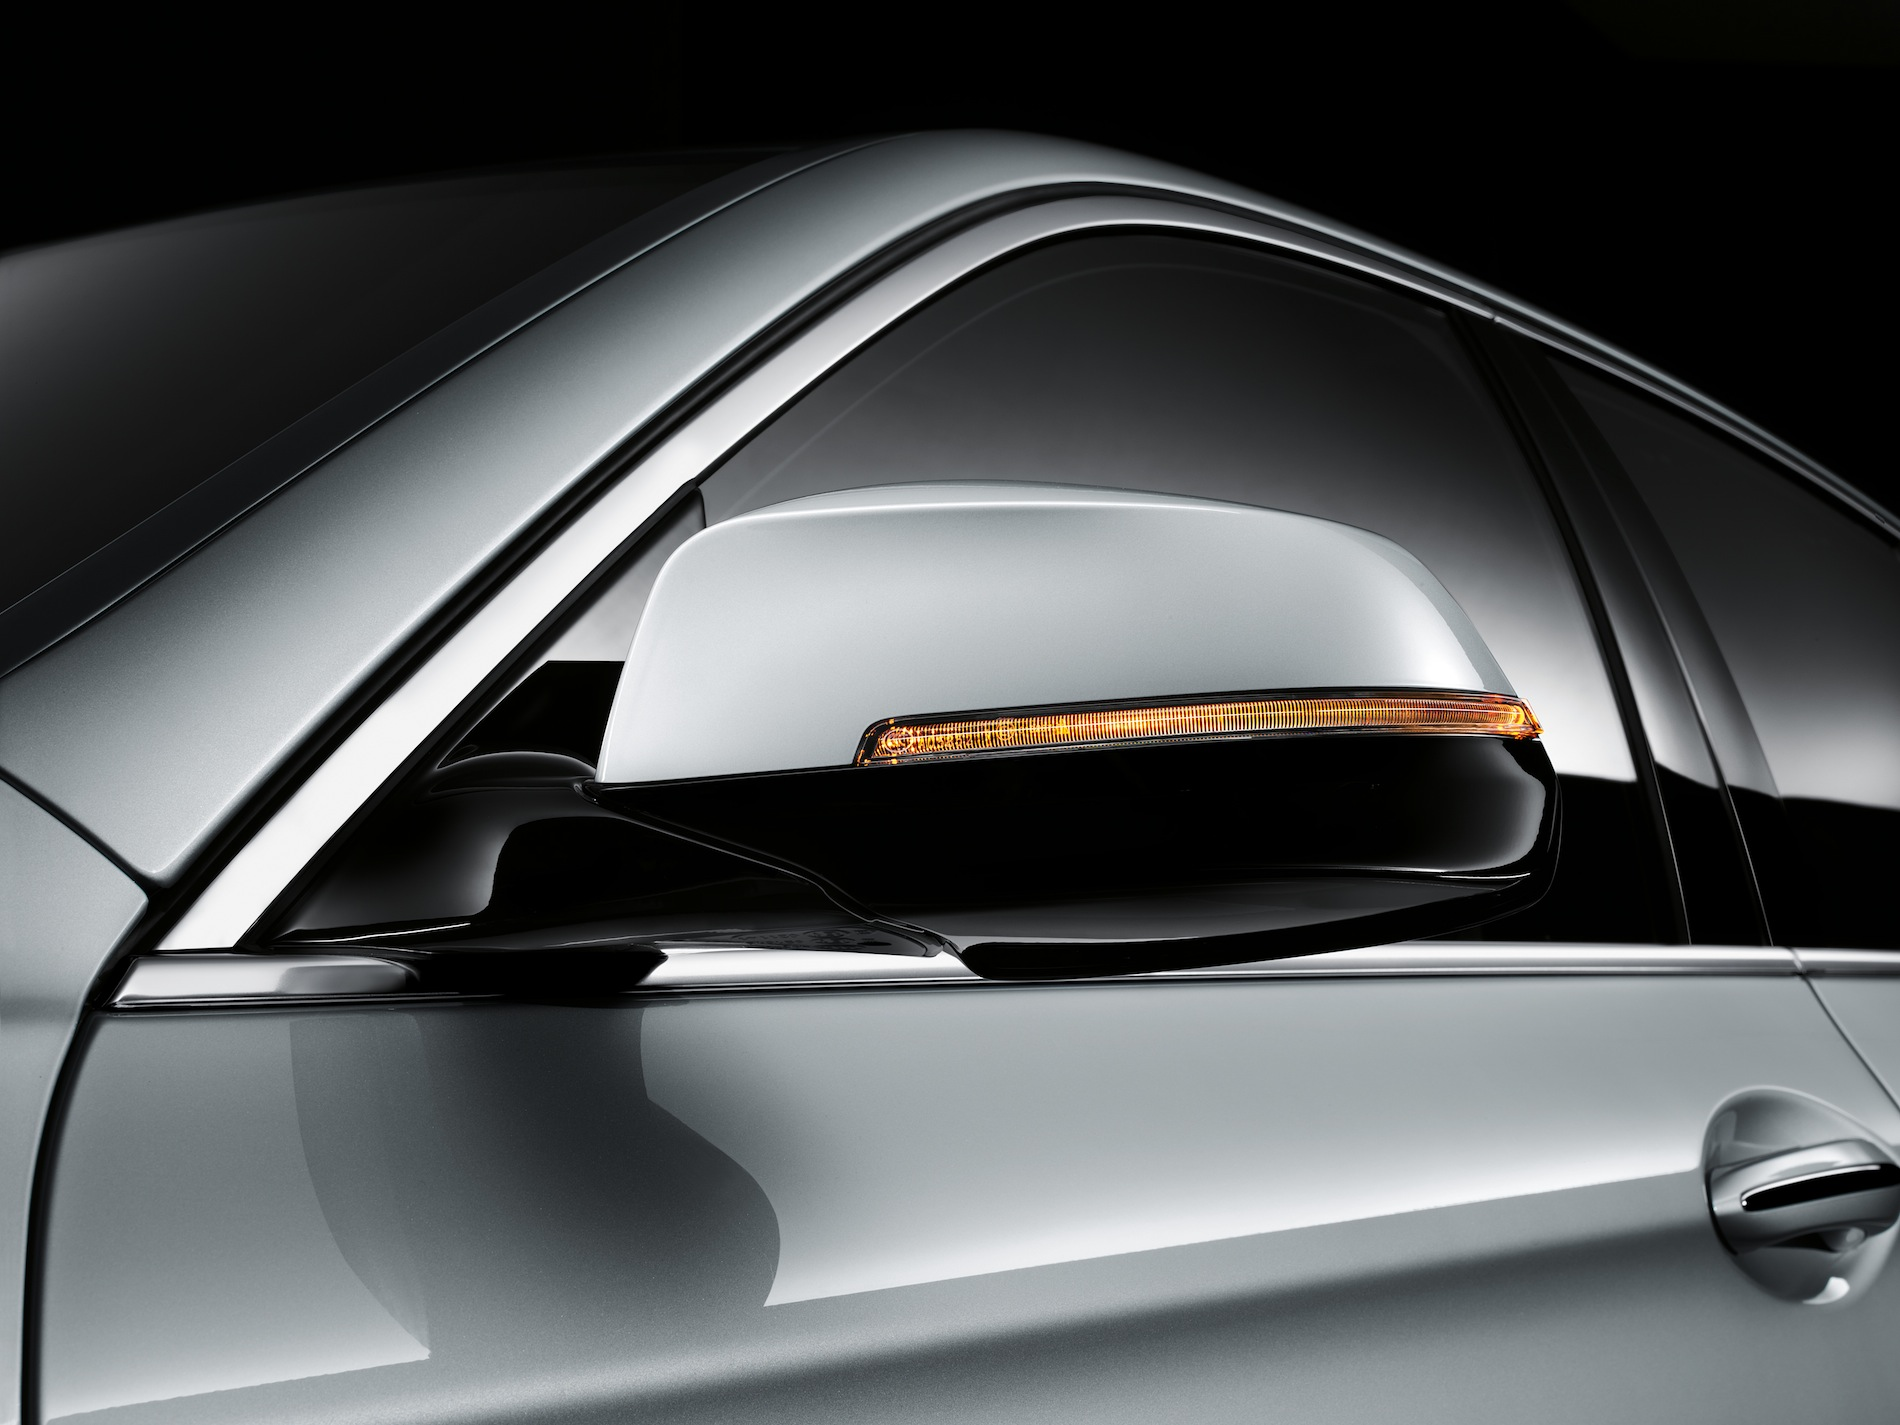 F10 Lci Side Mirror Retrofit Available From Elebest Bmw